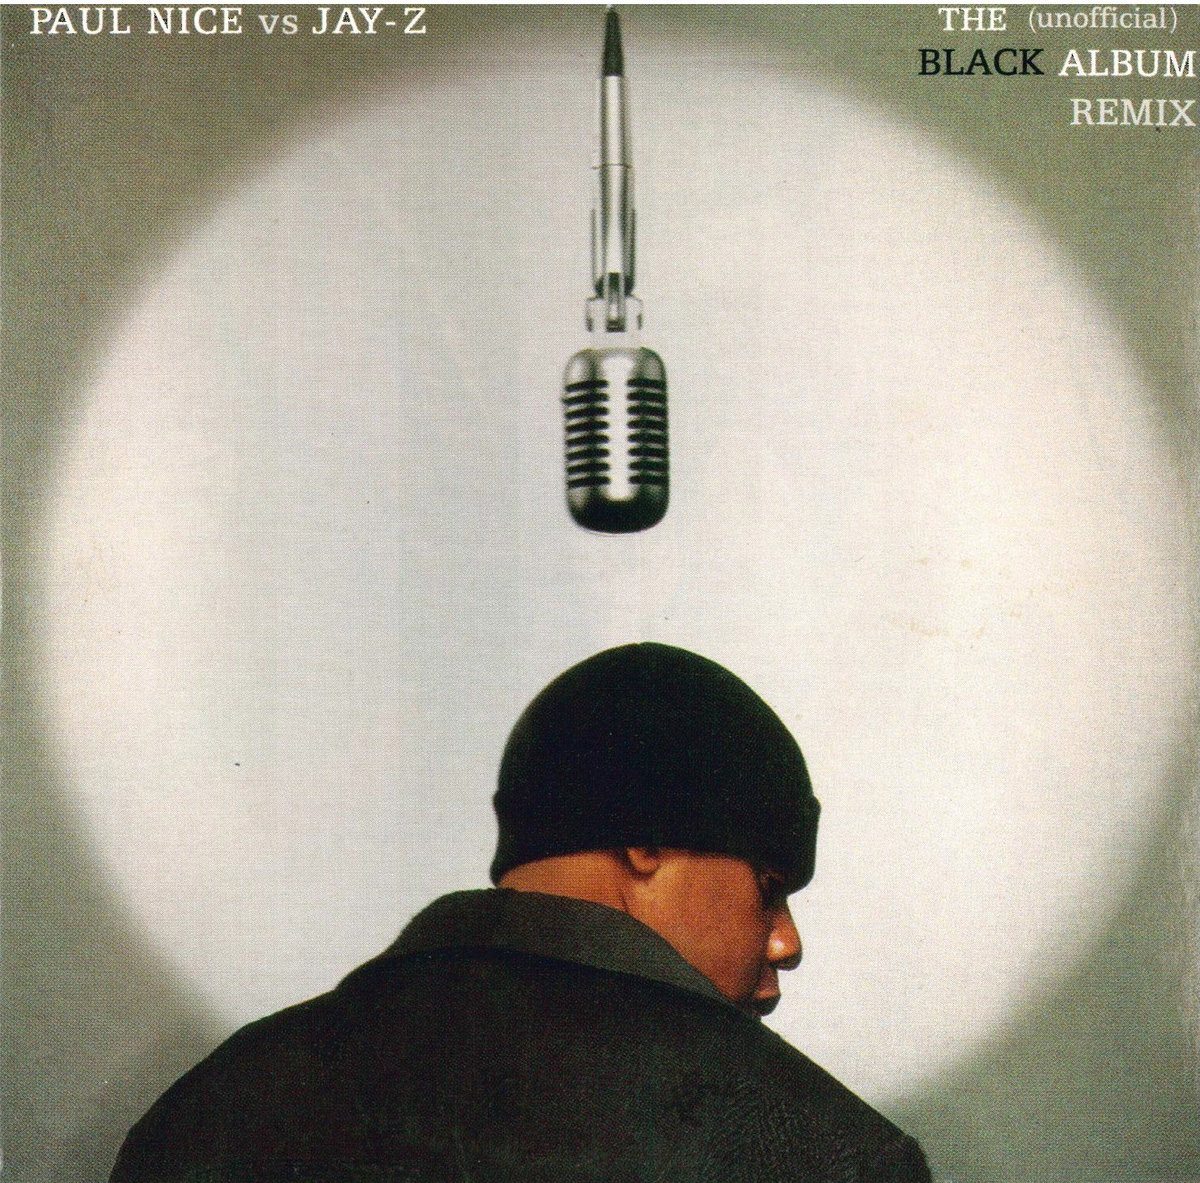 ... Public Service Announcement (Take 3 - instrumental). from The Black  Album Remix / Jay - Z by Paul Nice vs Jay-Z